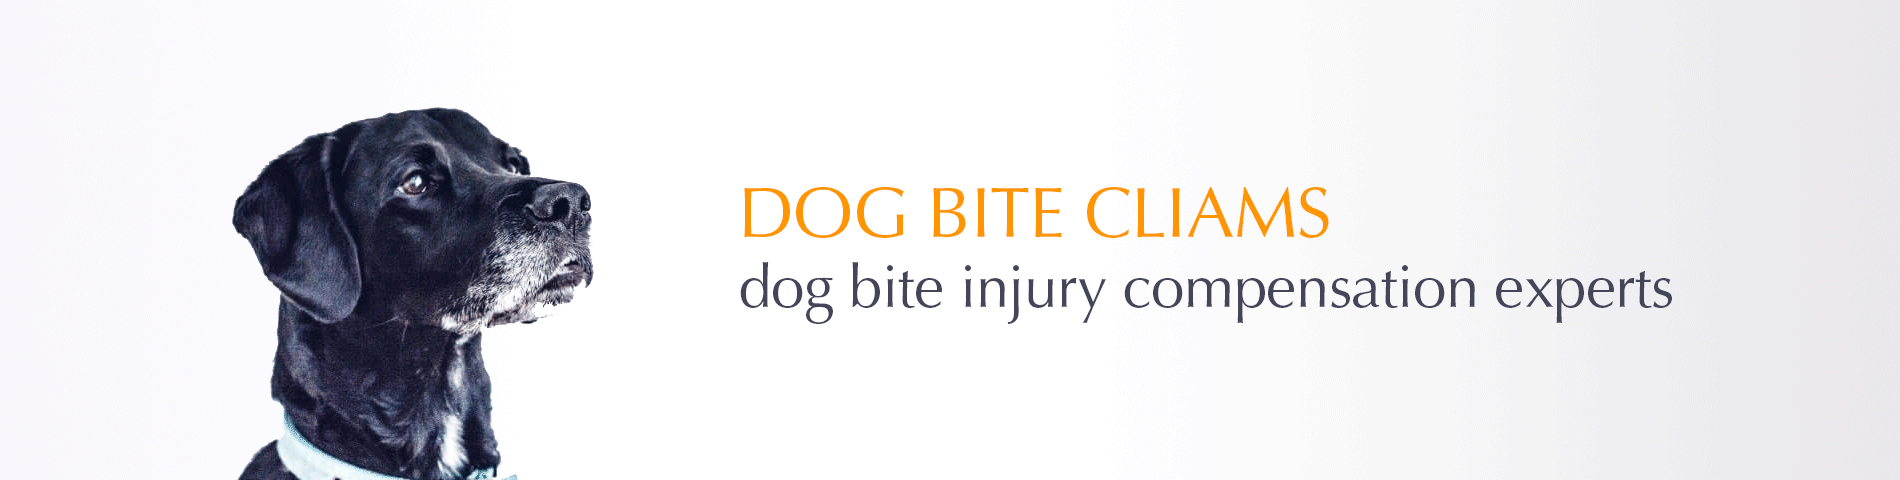 Dogbite mental trauma claim